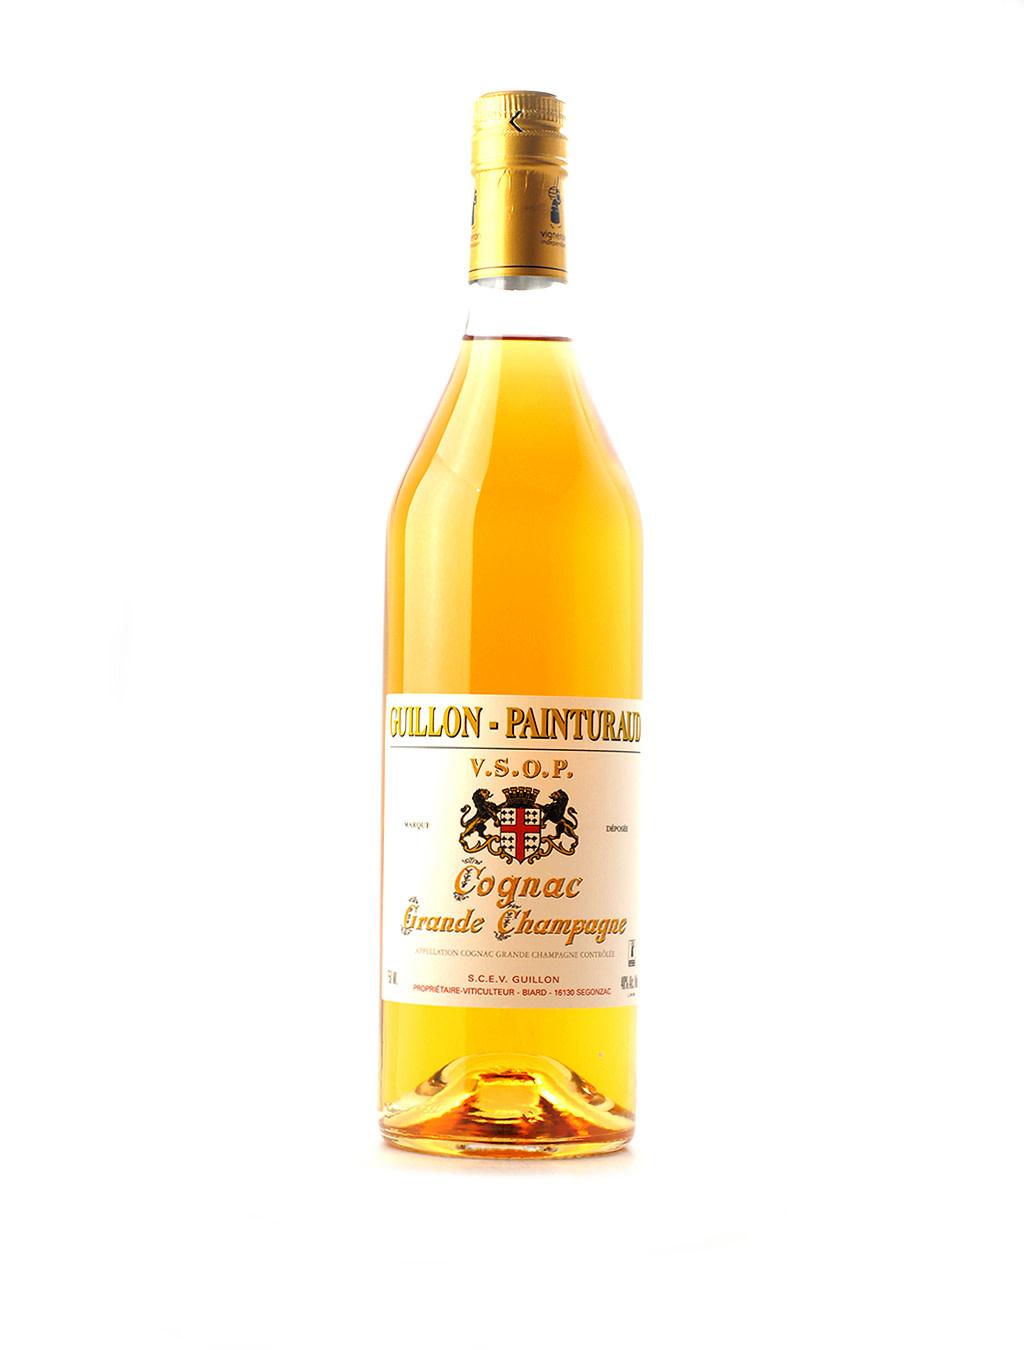 Guillon-Painturaud Cognac VSOP